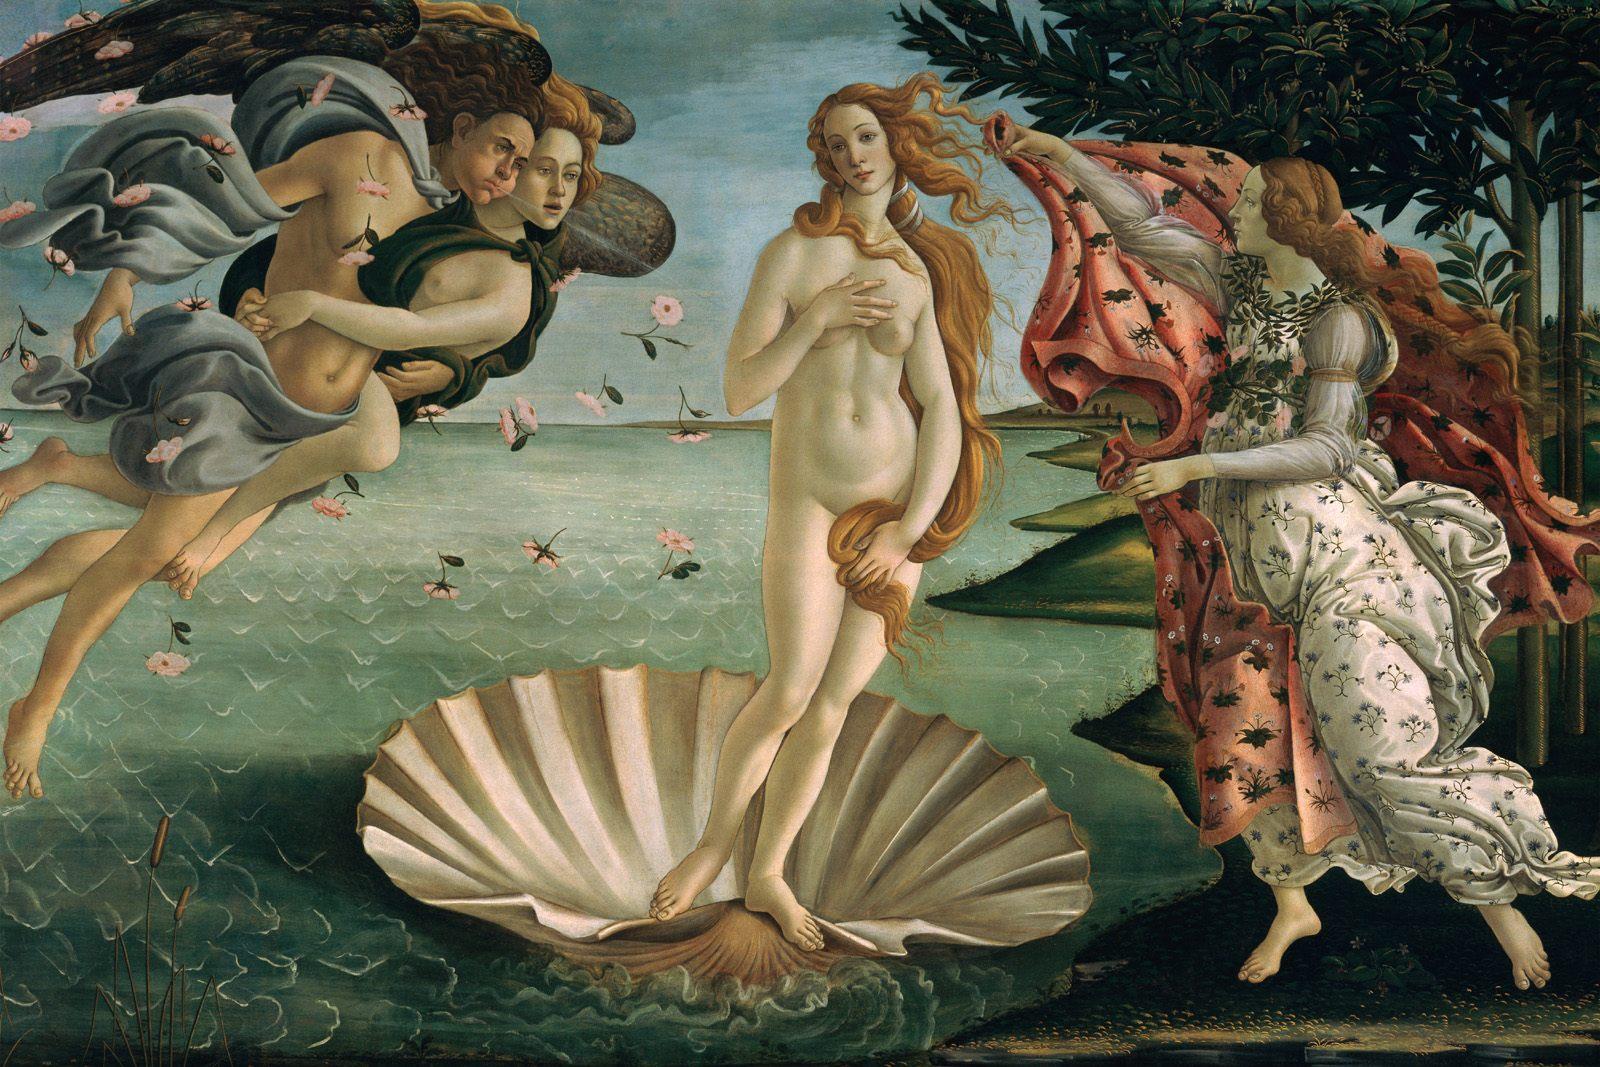 http://uploads5.wikipaintings.org/images/sandro-botticelli/the-birth-of-venus-1485(1).jpg